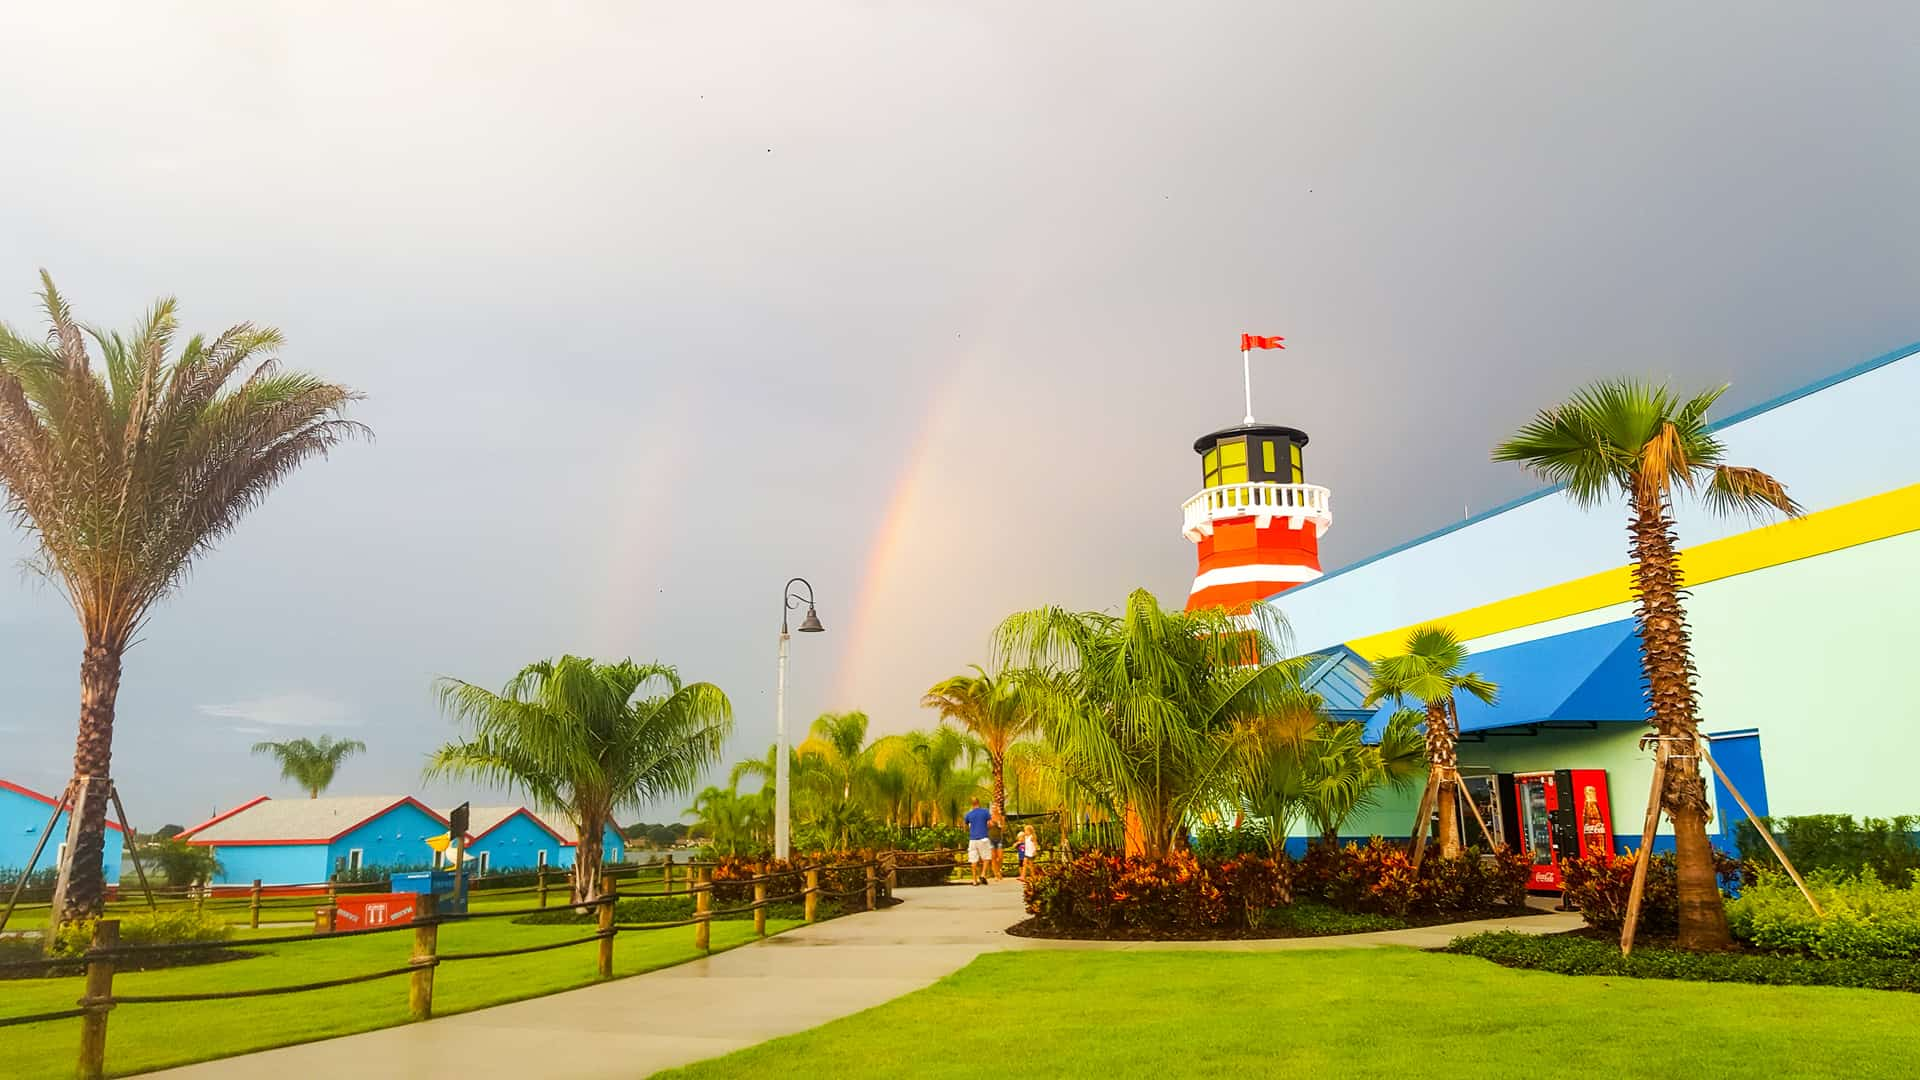 Double Rainbow over Legoland Florida beach retreat